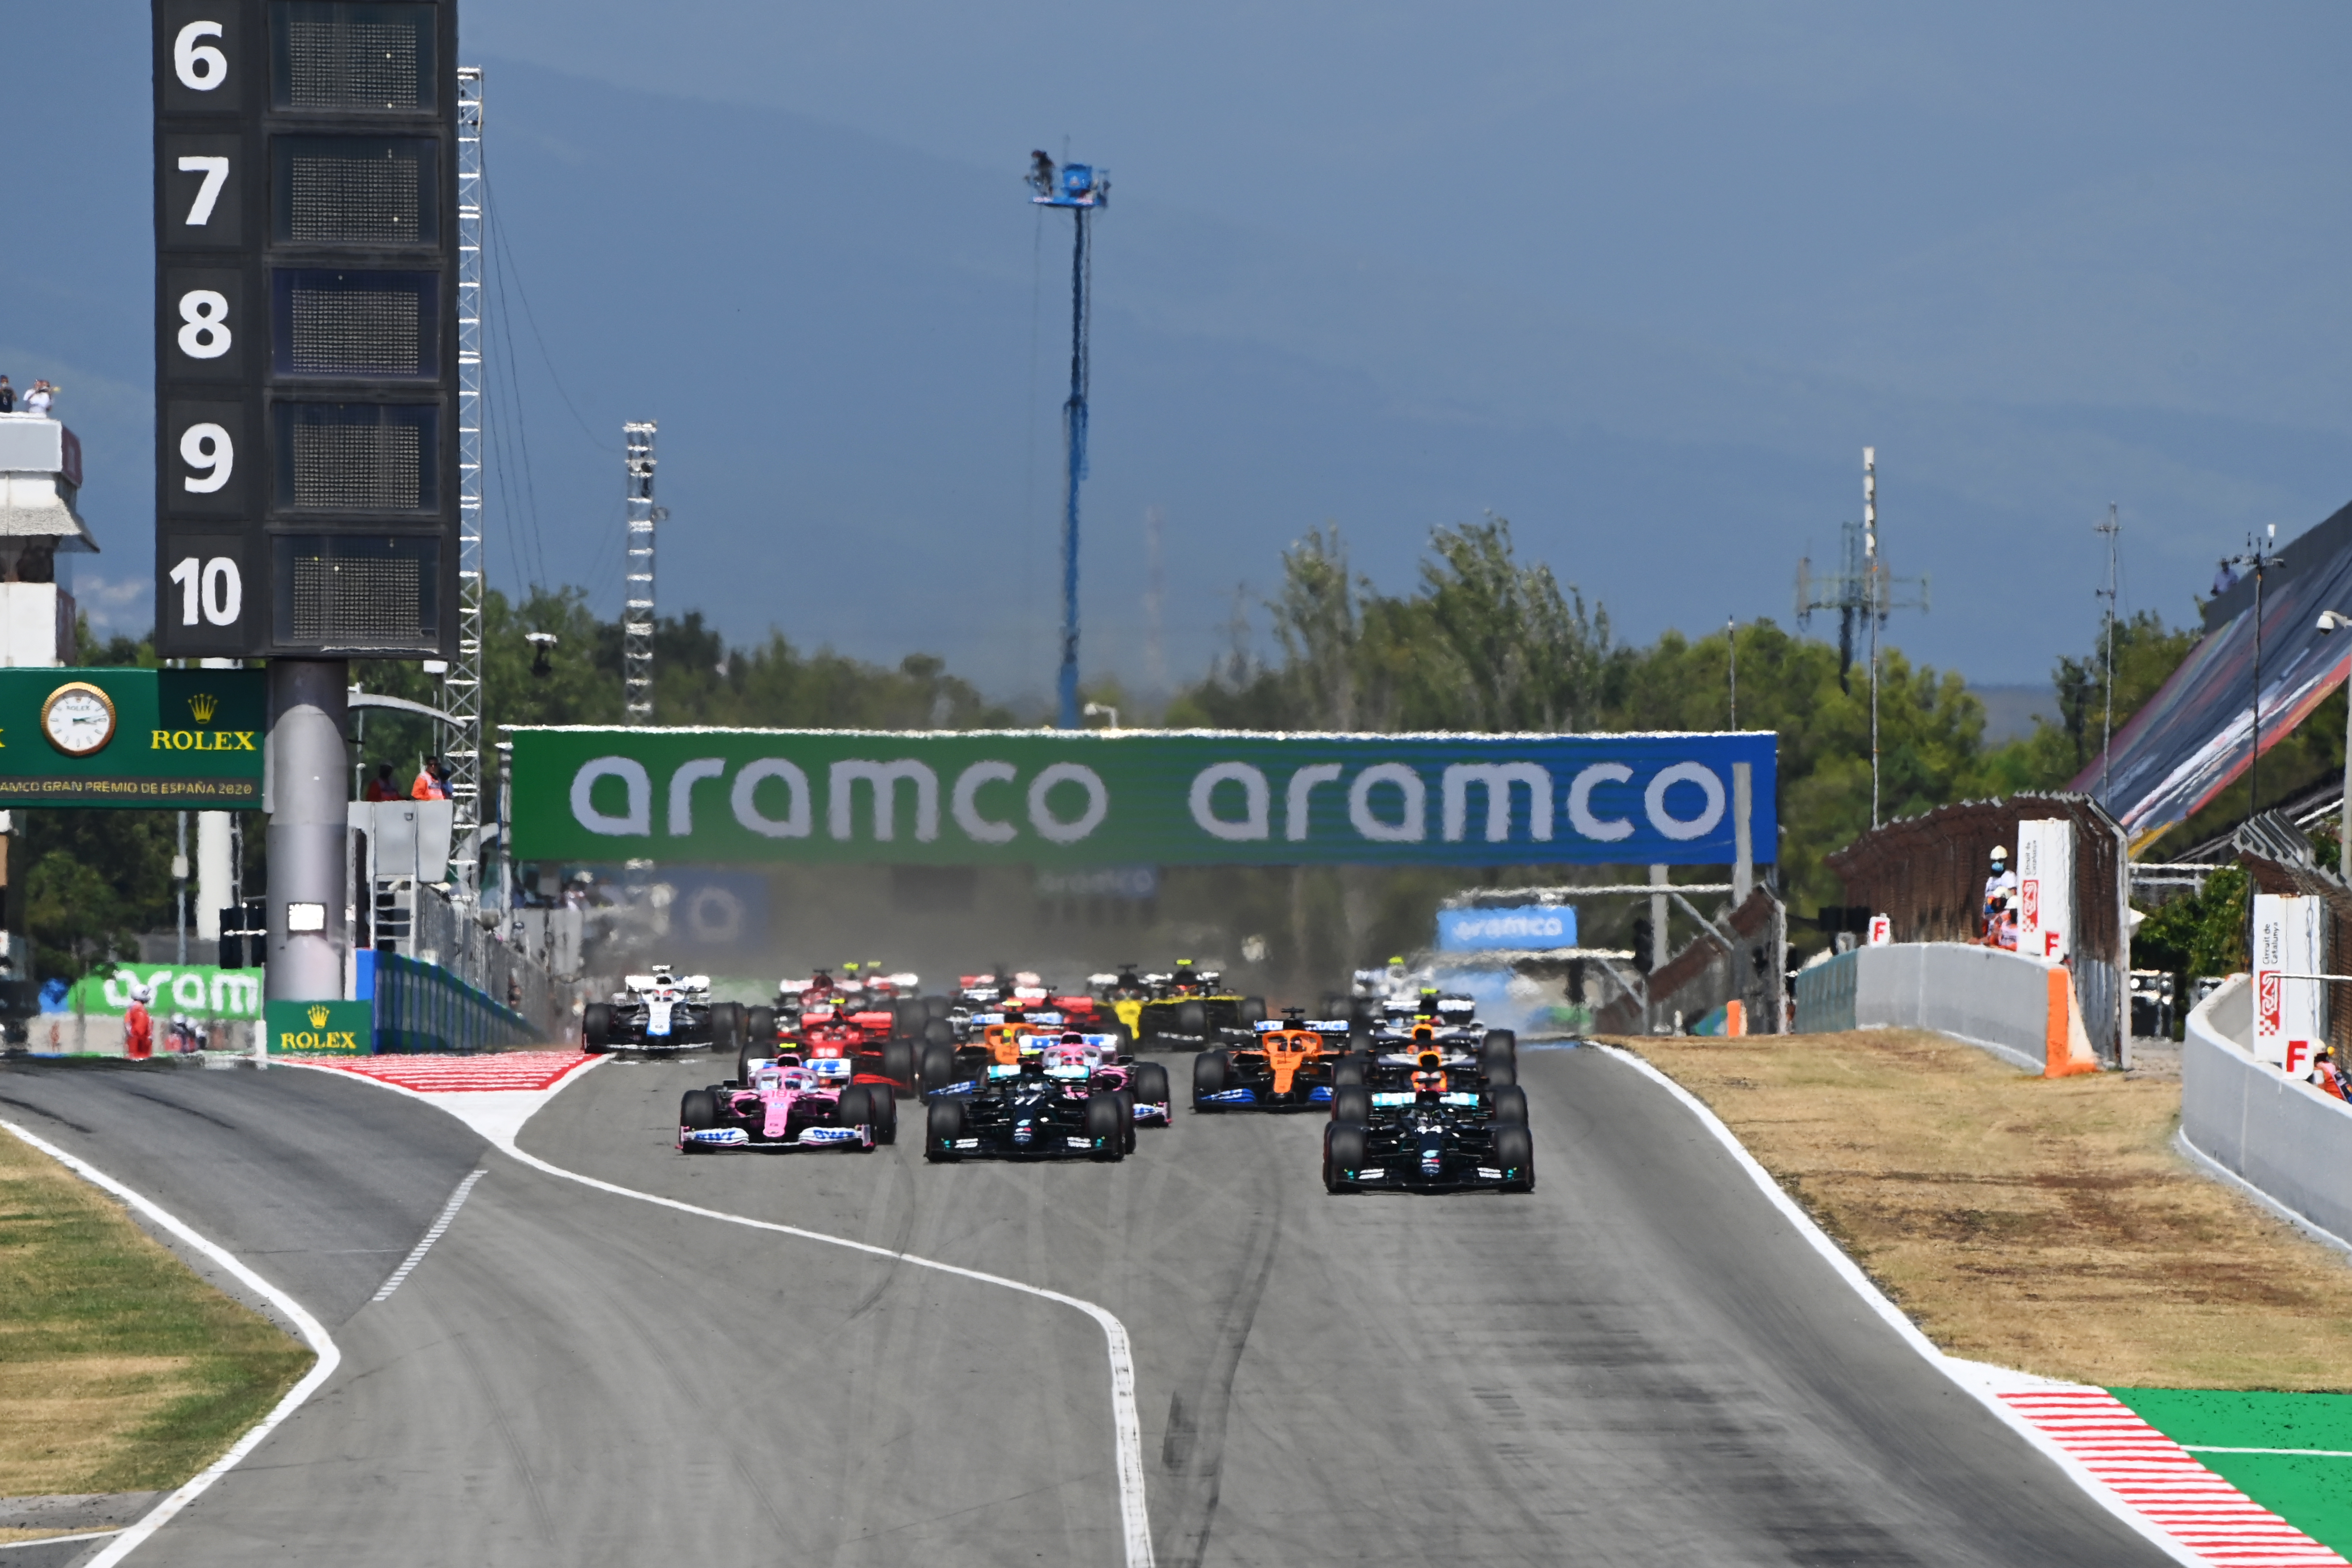 Motor Racing Formula One World Championship Spanish Grand Prix Race Day Barcelona, Spain